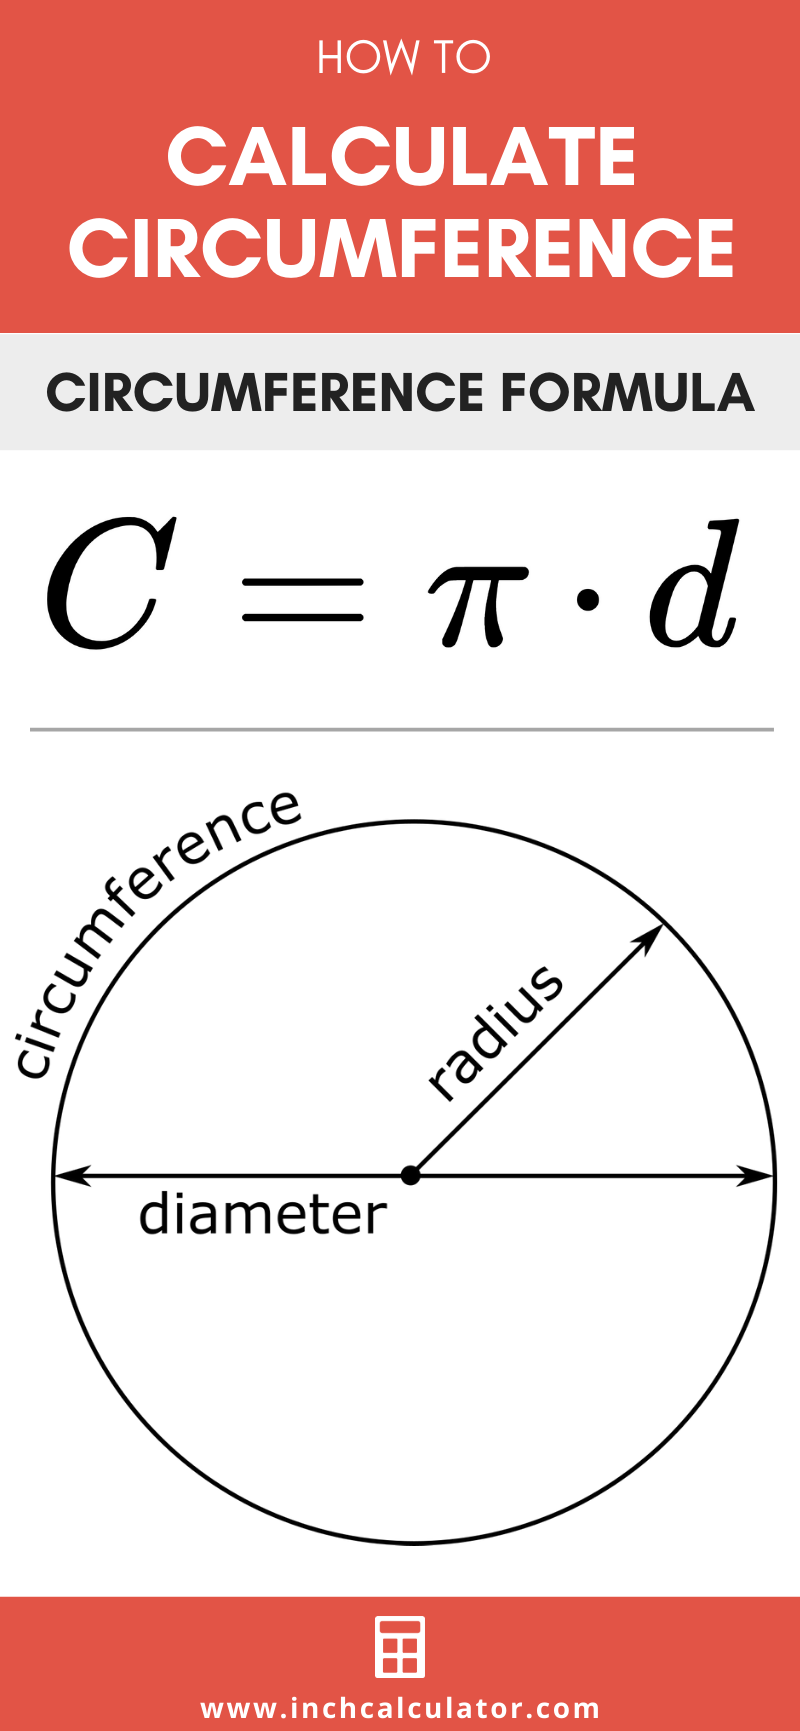 Share circumference calculator